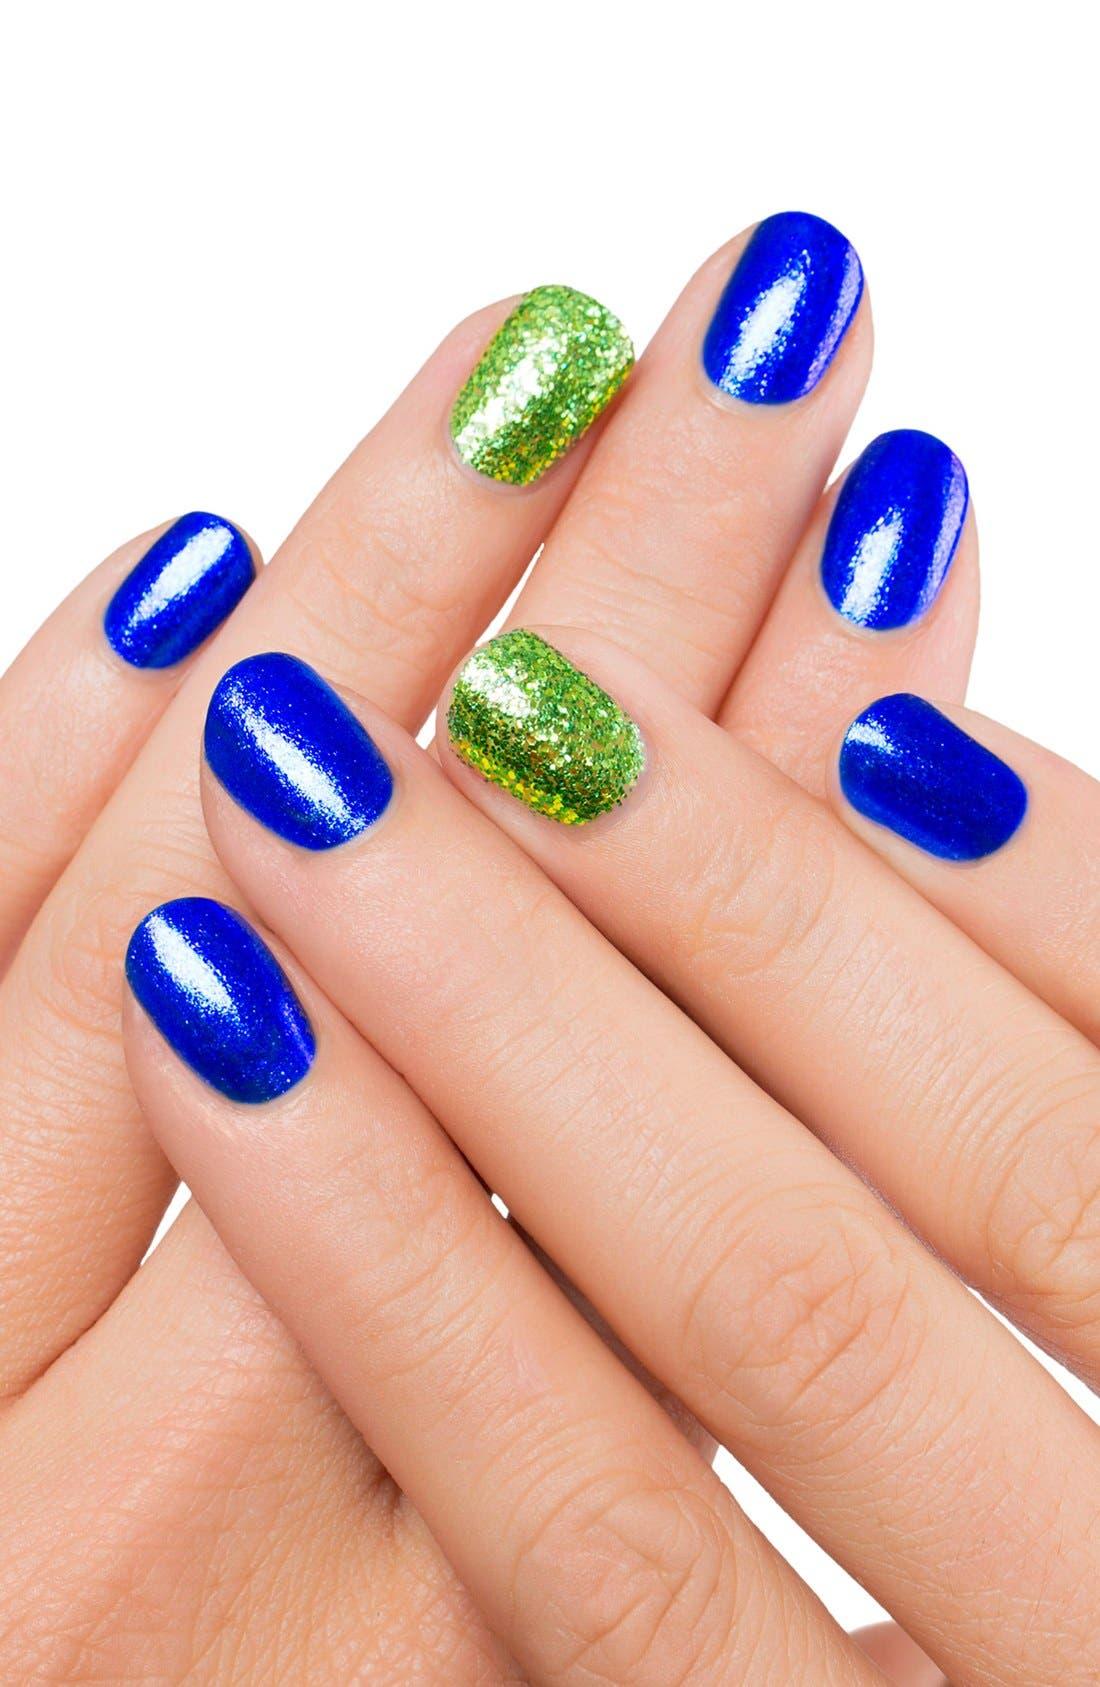 Julep<sup>™</sup> 'Little Lights' Nail Color Set,                             Alternate thumbnail 6, color,                             960